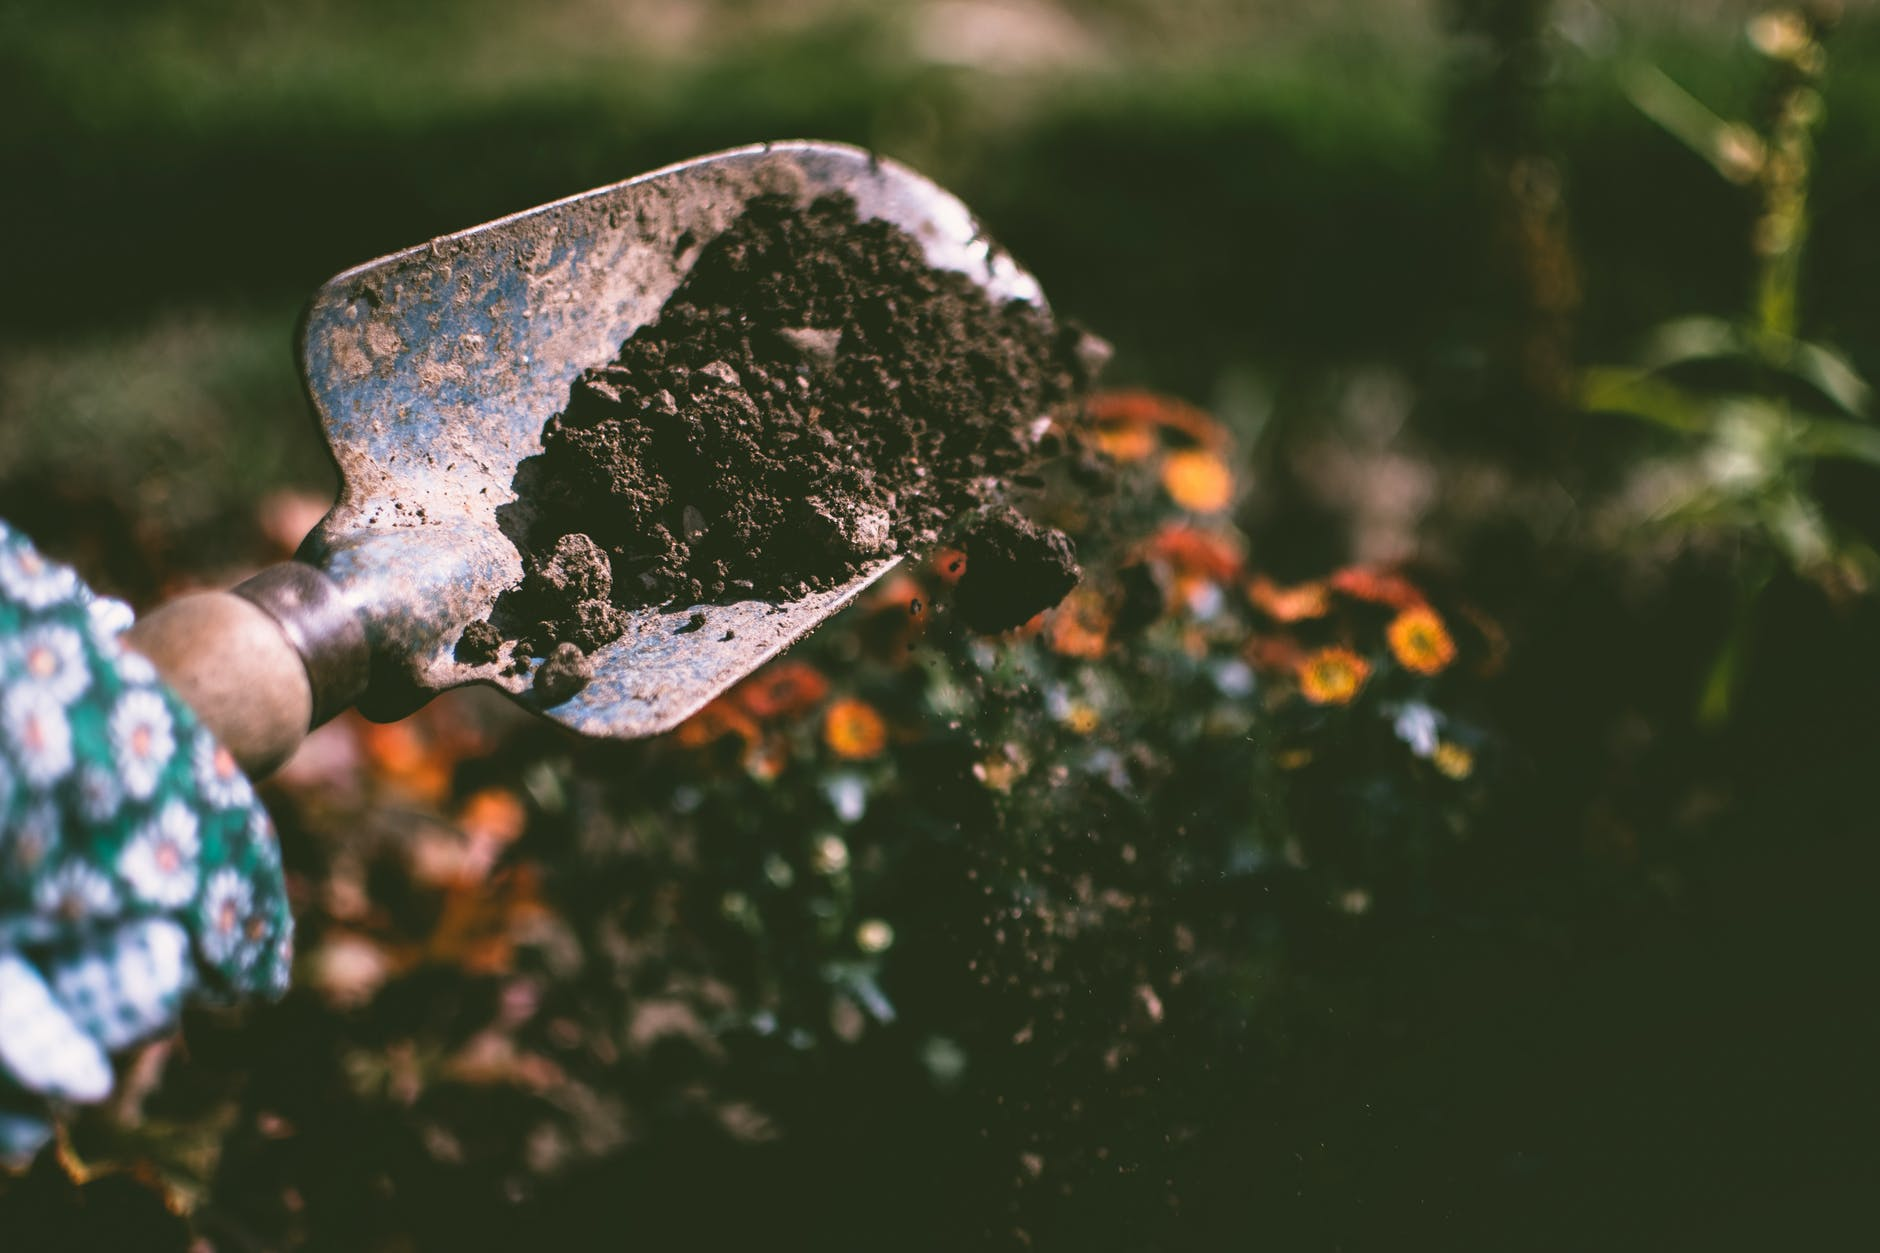 person digging soil using garden shovel best fertilizer for tomatoes